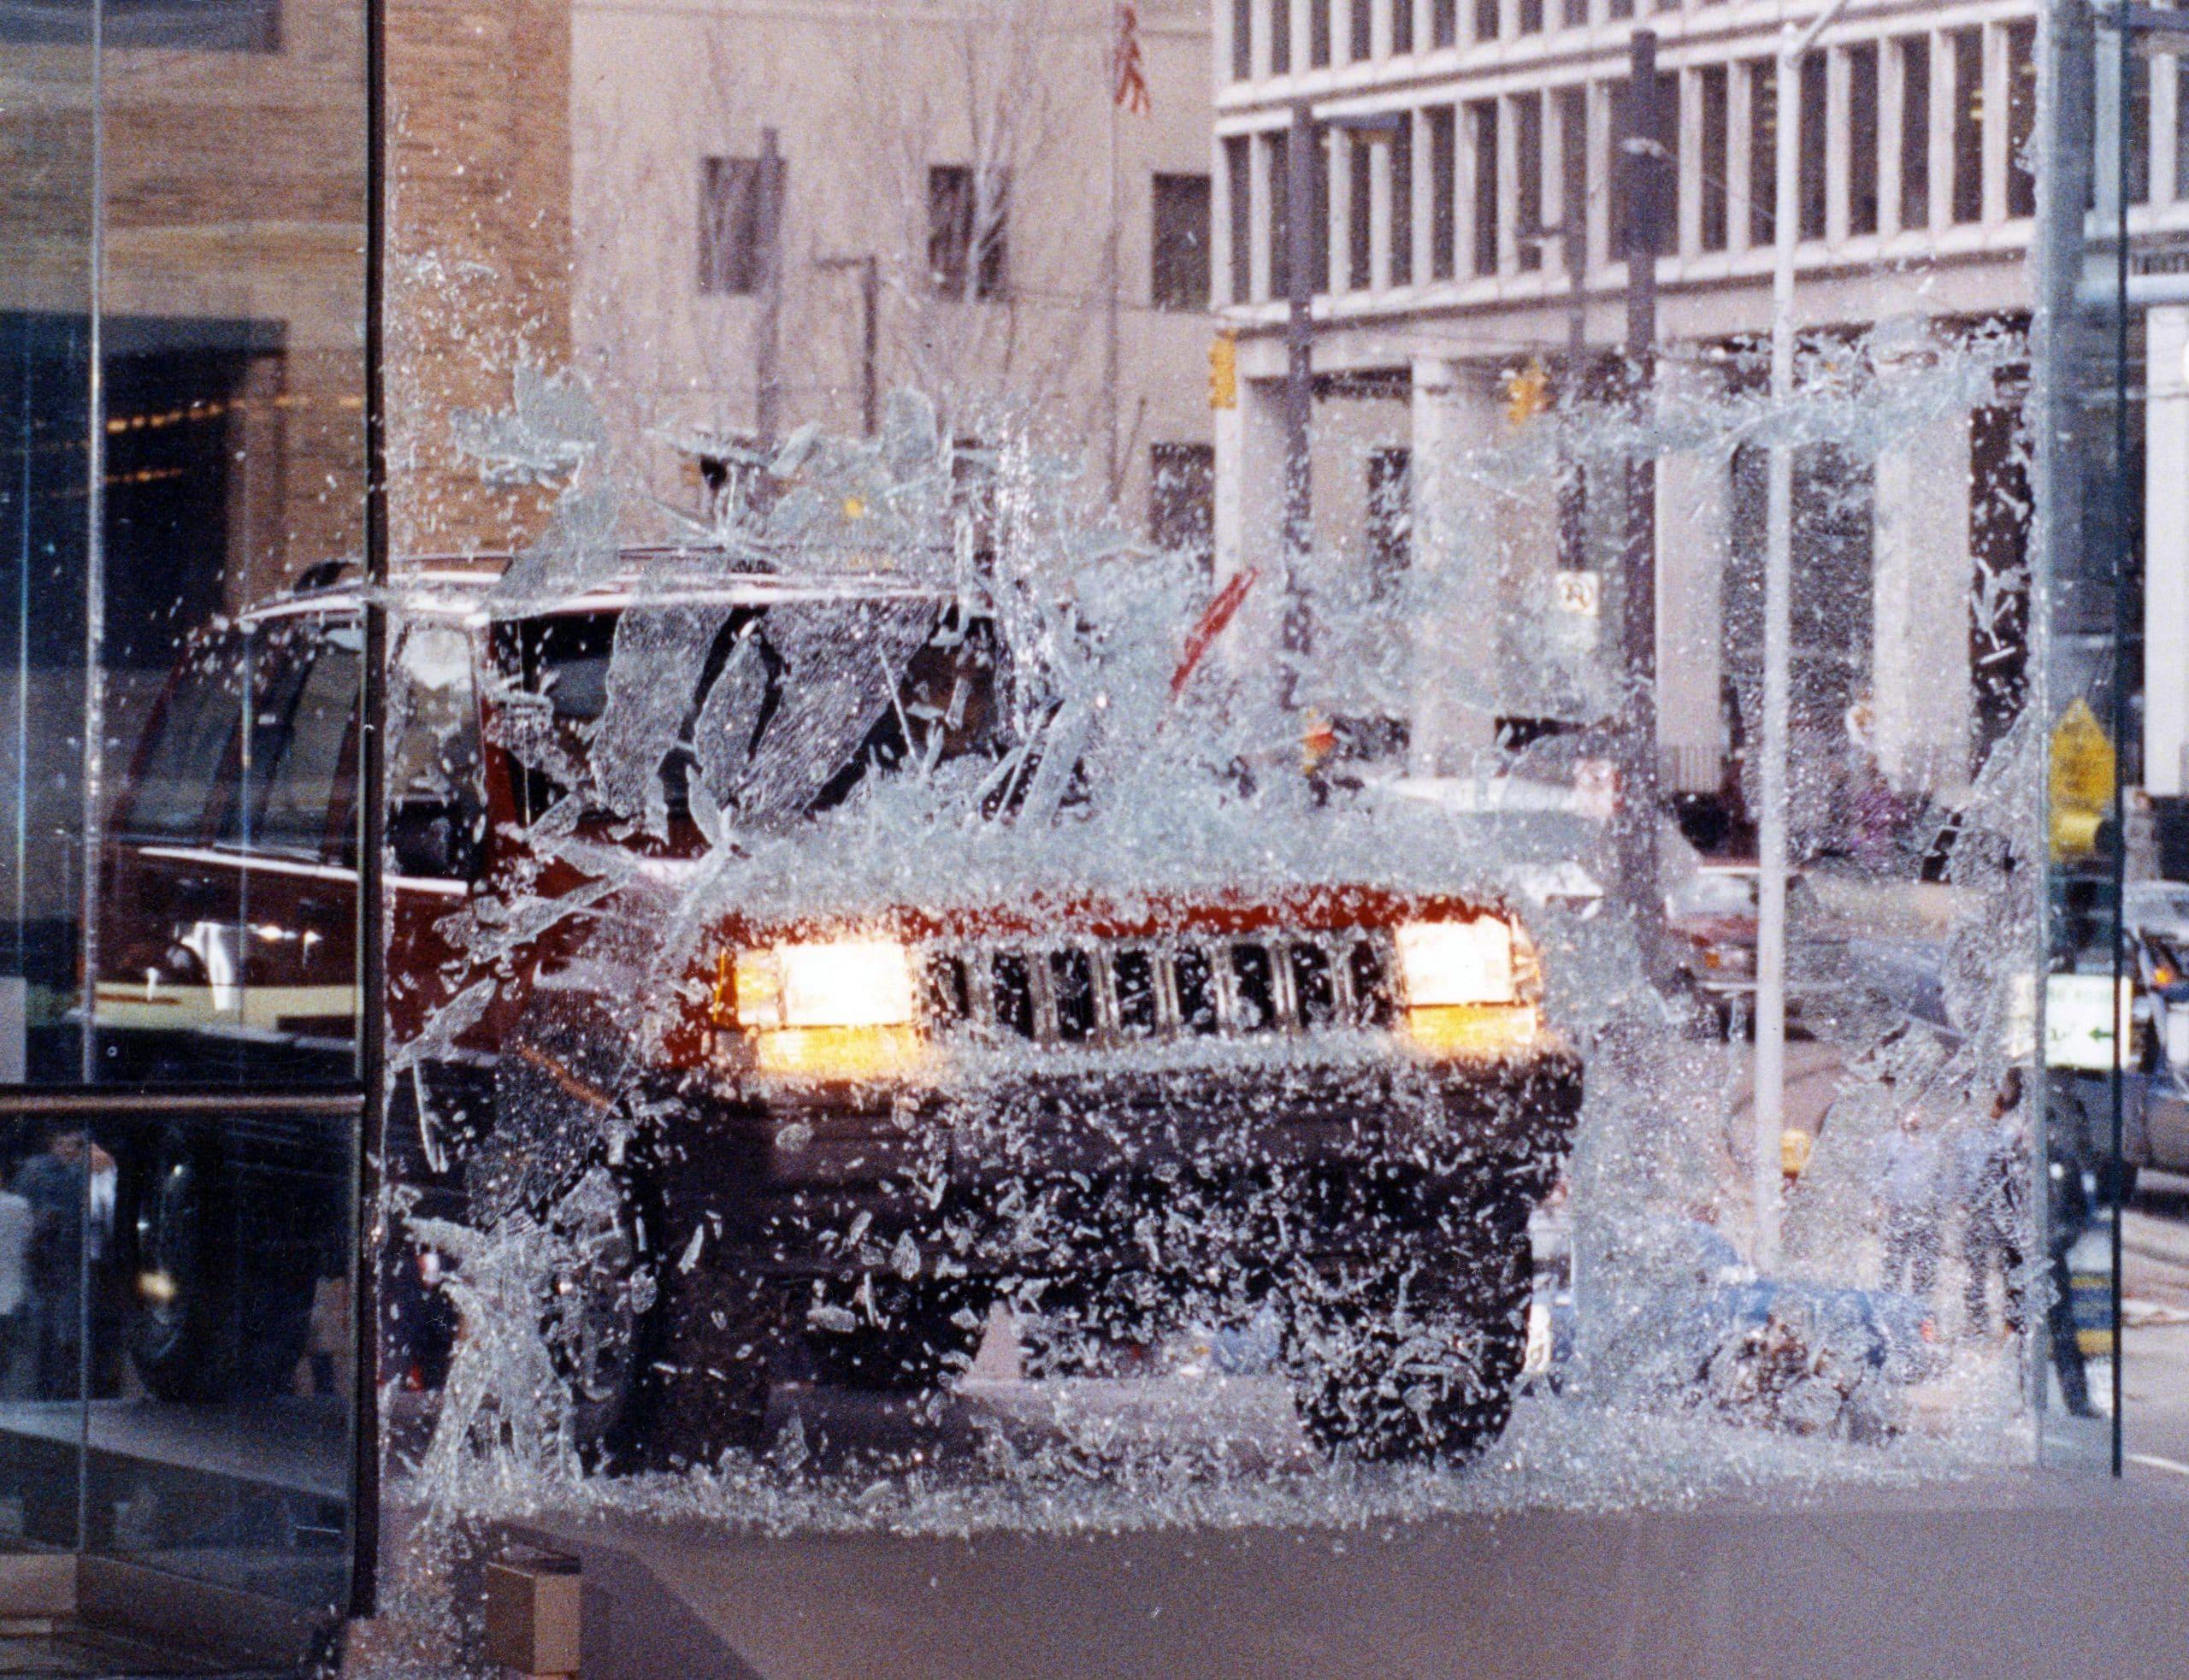 5th moment 1992 Detroit Auto Show Jeep Through Glass scaled 12 ορόσημα, για τα 80α γενέθλια της Jeep Jeep, Jeep Cherokee, Jeep Compass, Jeep Gladiator, Jeep Grand Cherokee, Jeep Renegade, Jeep Willys, Jeep Wrangler, ειδήσεις, Νέα